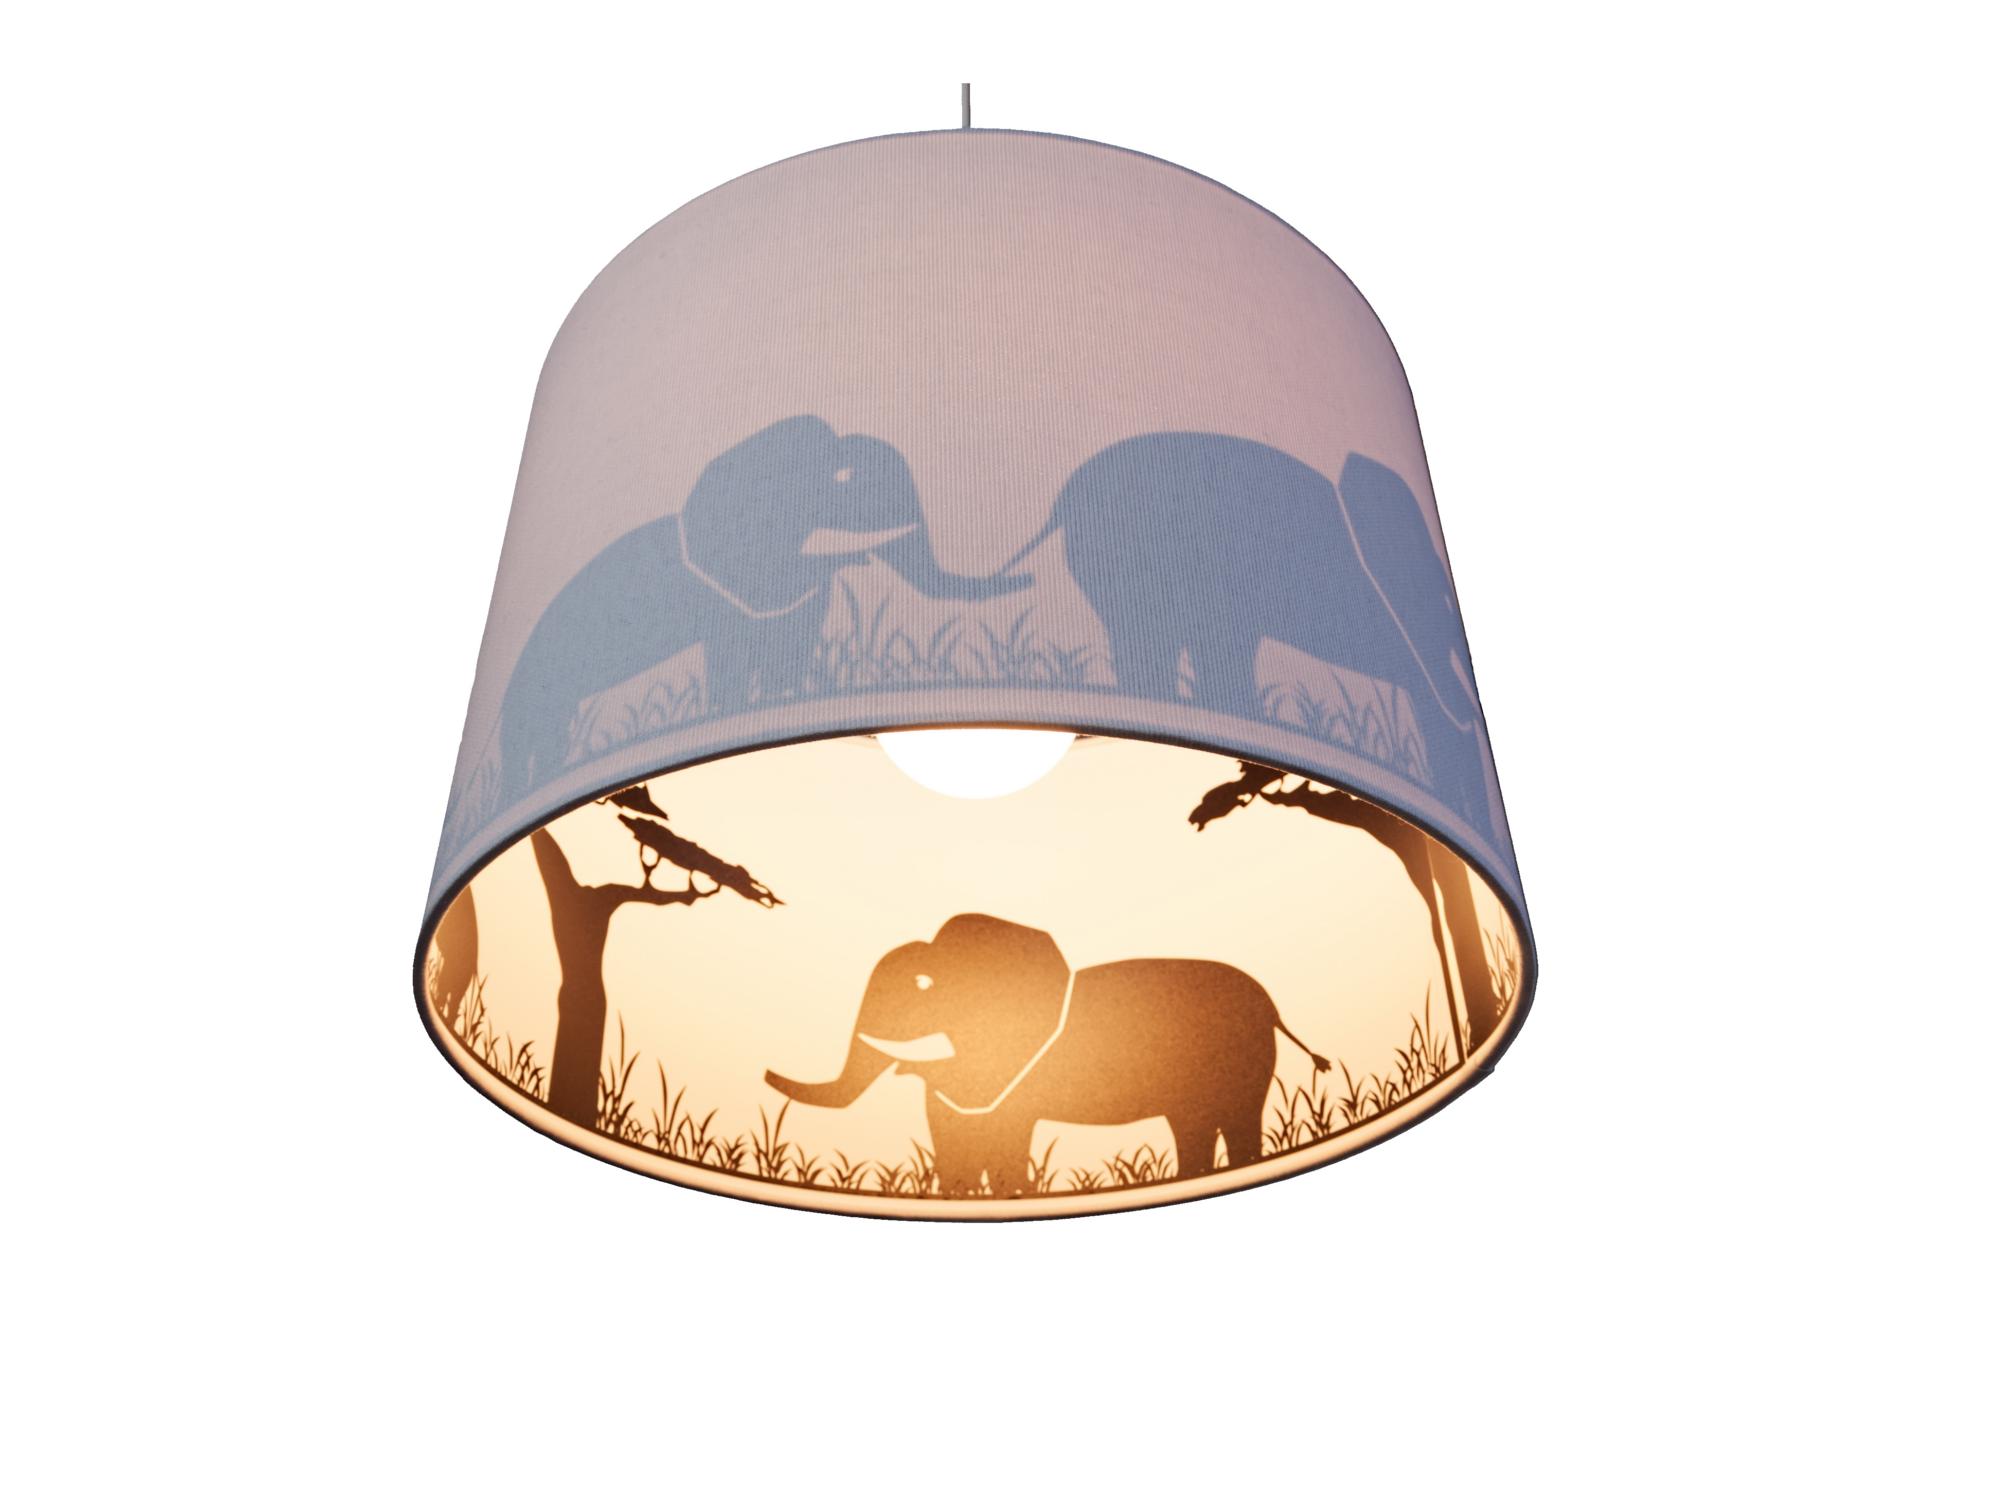 Waldi Pendelleuchte Elefant Silhouette Grau